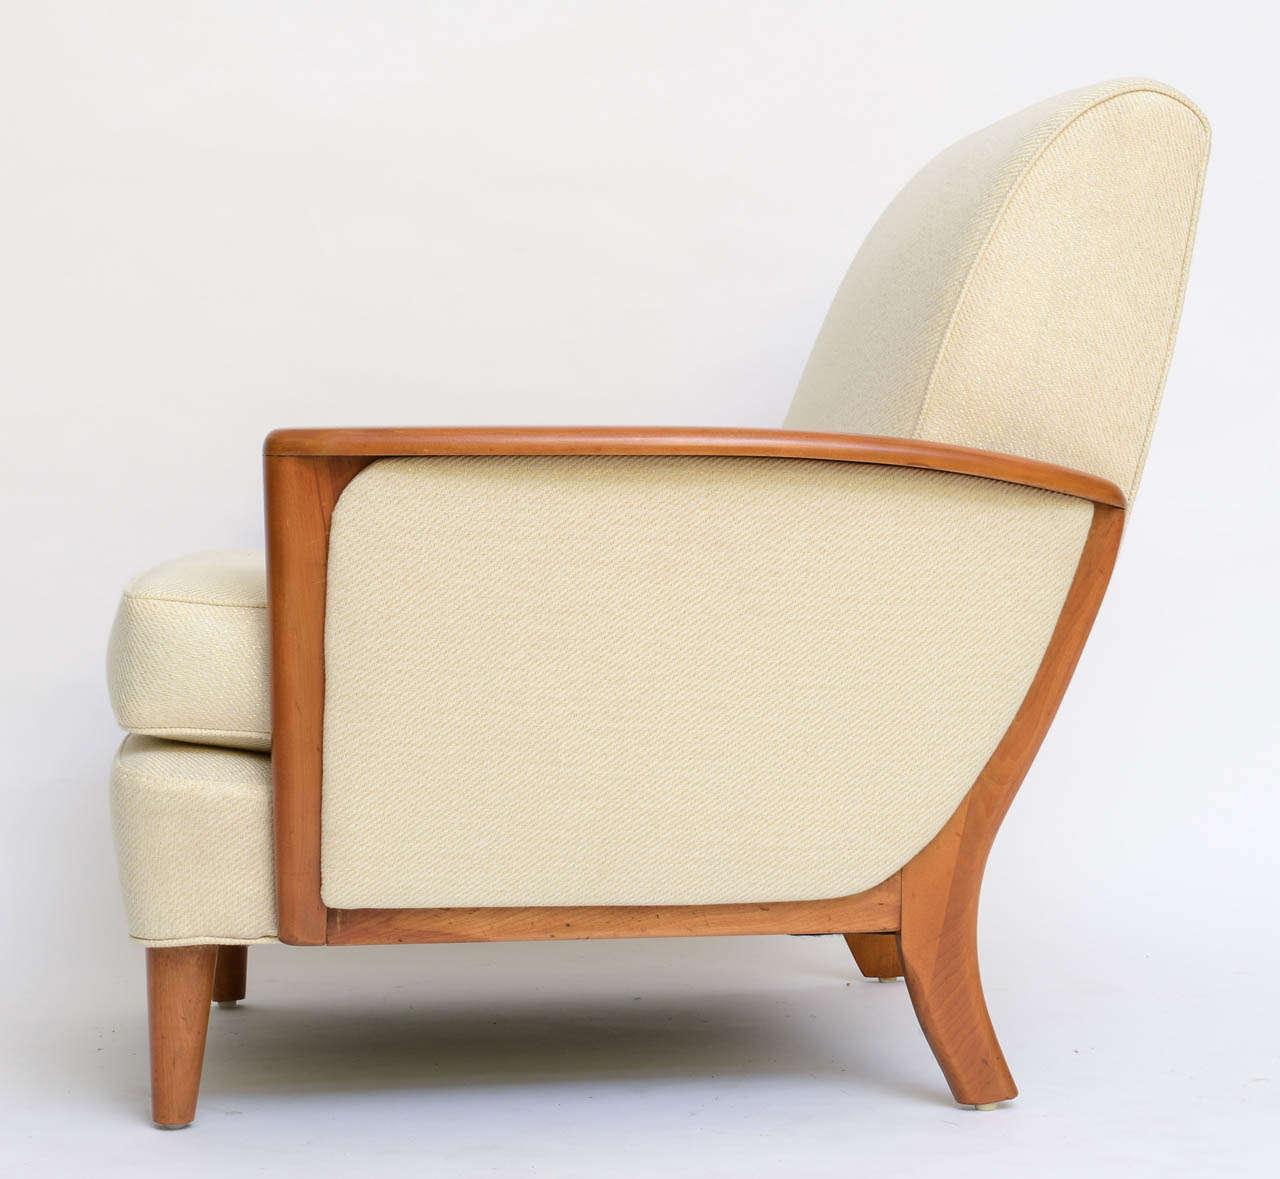 1941 Streamline Modern Lounge Chair By Heywood Wakefield